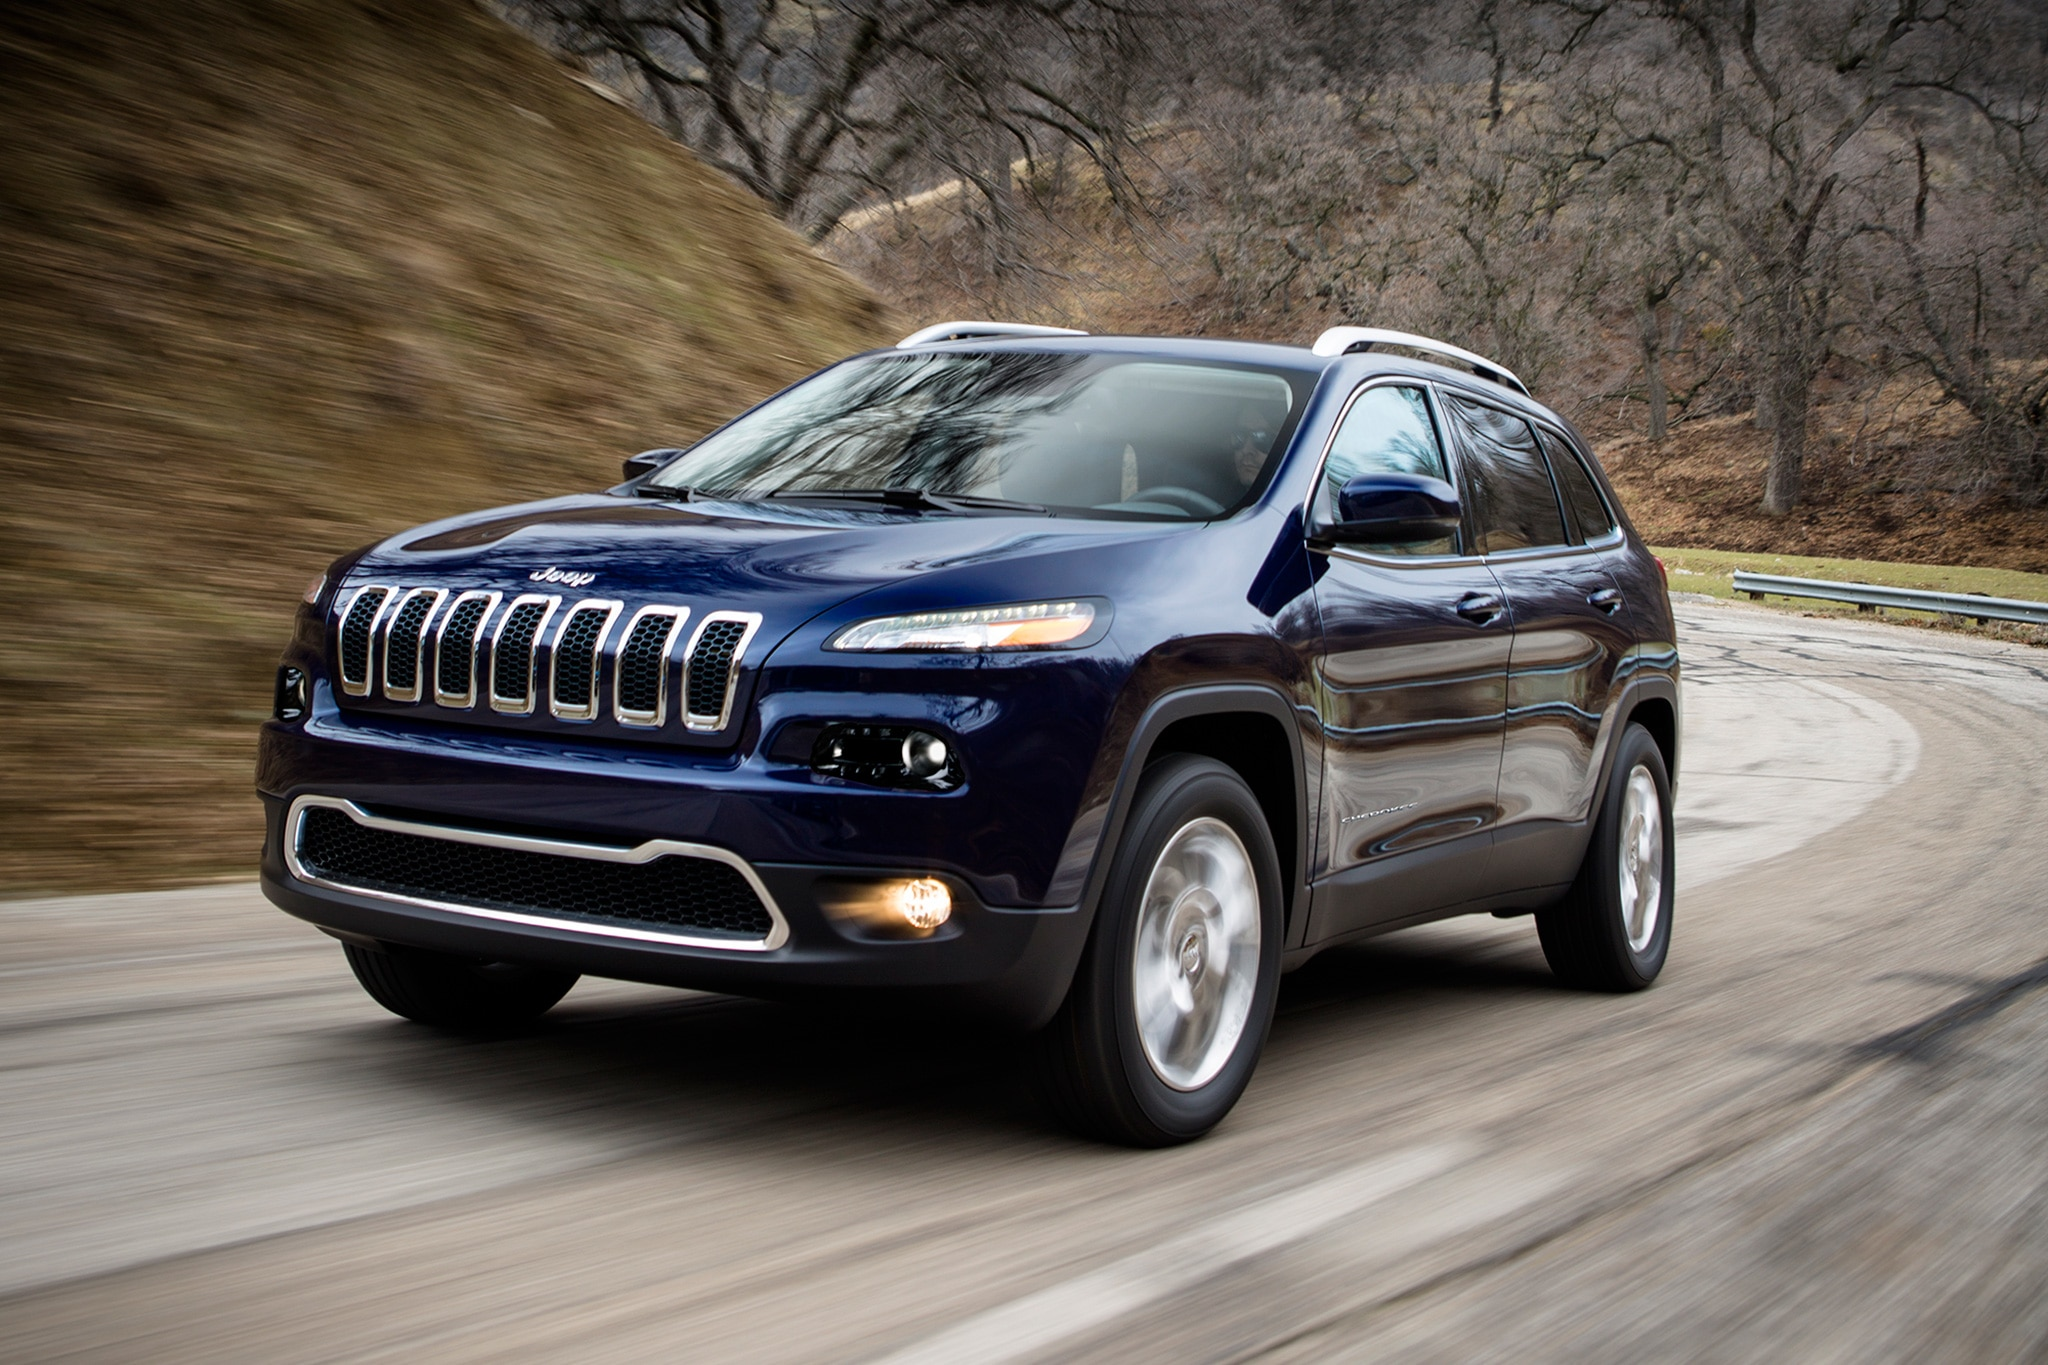 2017 Jeep Cherokee Limited front three quarter in motion 01 بهترین اتومبیل های تخفیف در آوریل ۴۰۰۰ دلار و بالاتر   اجاره ماشین